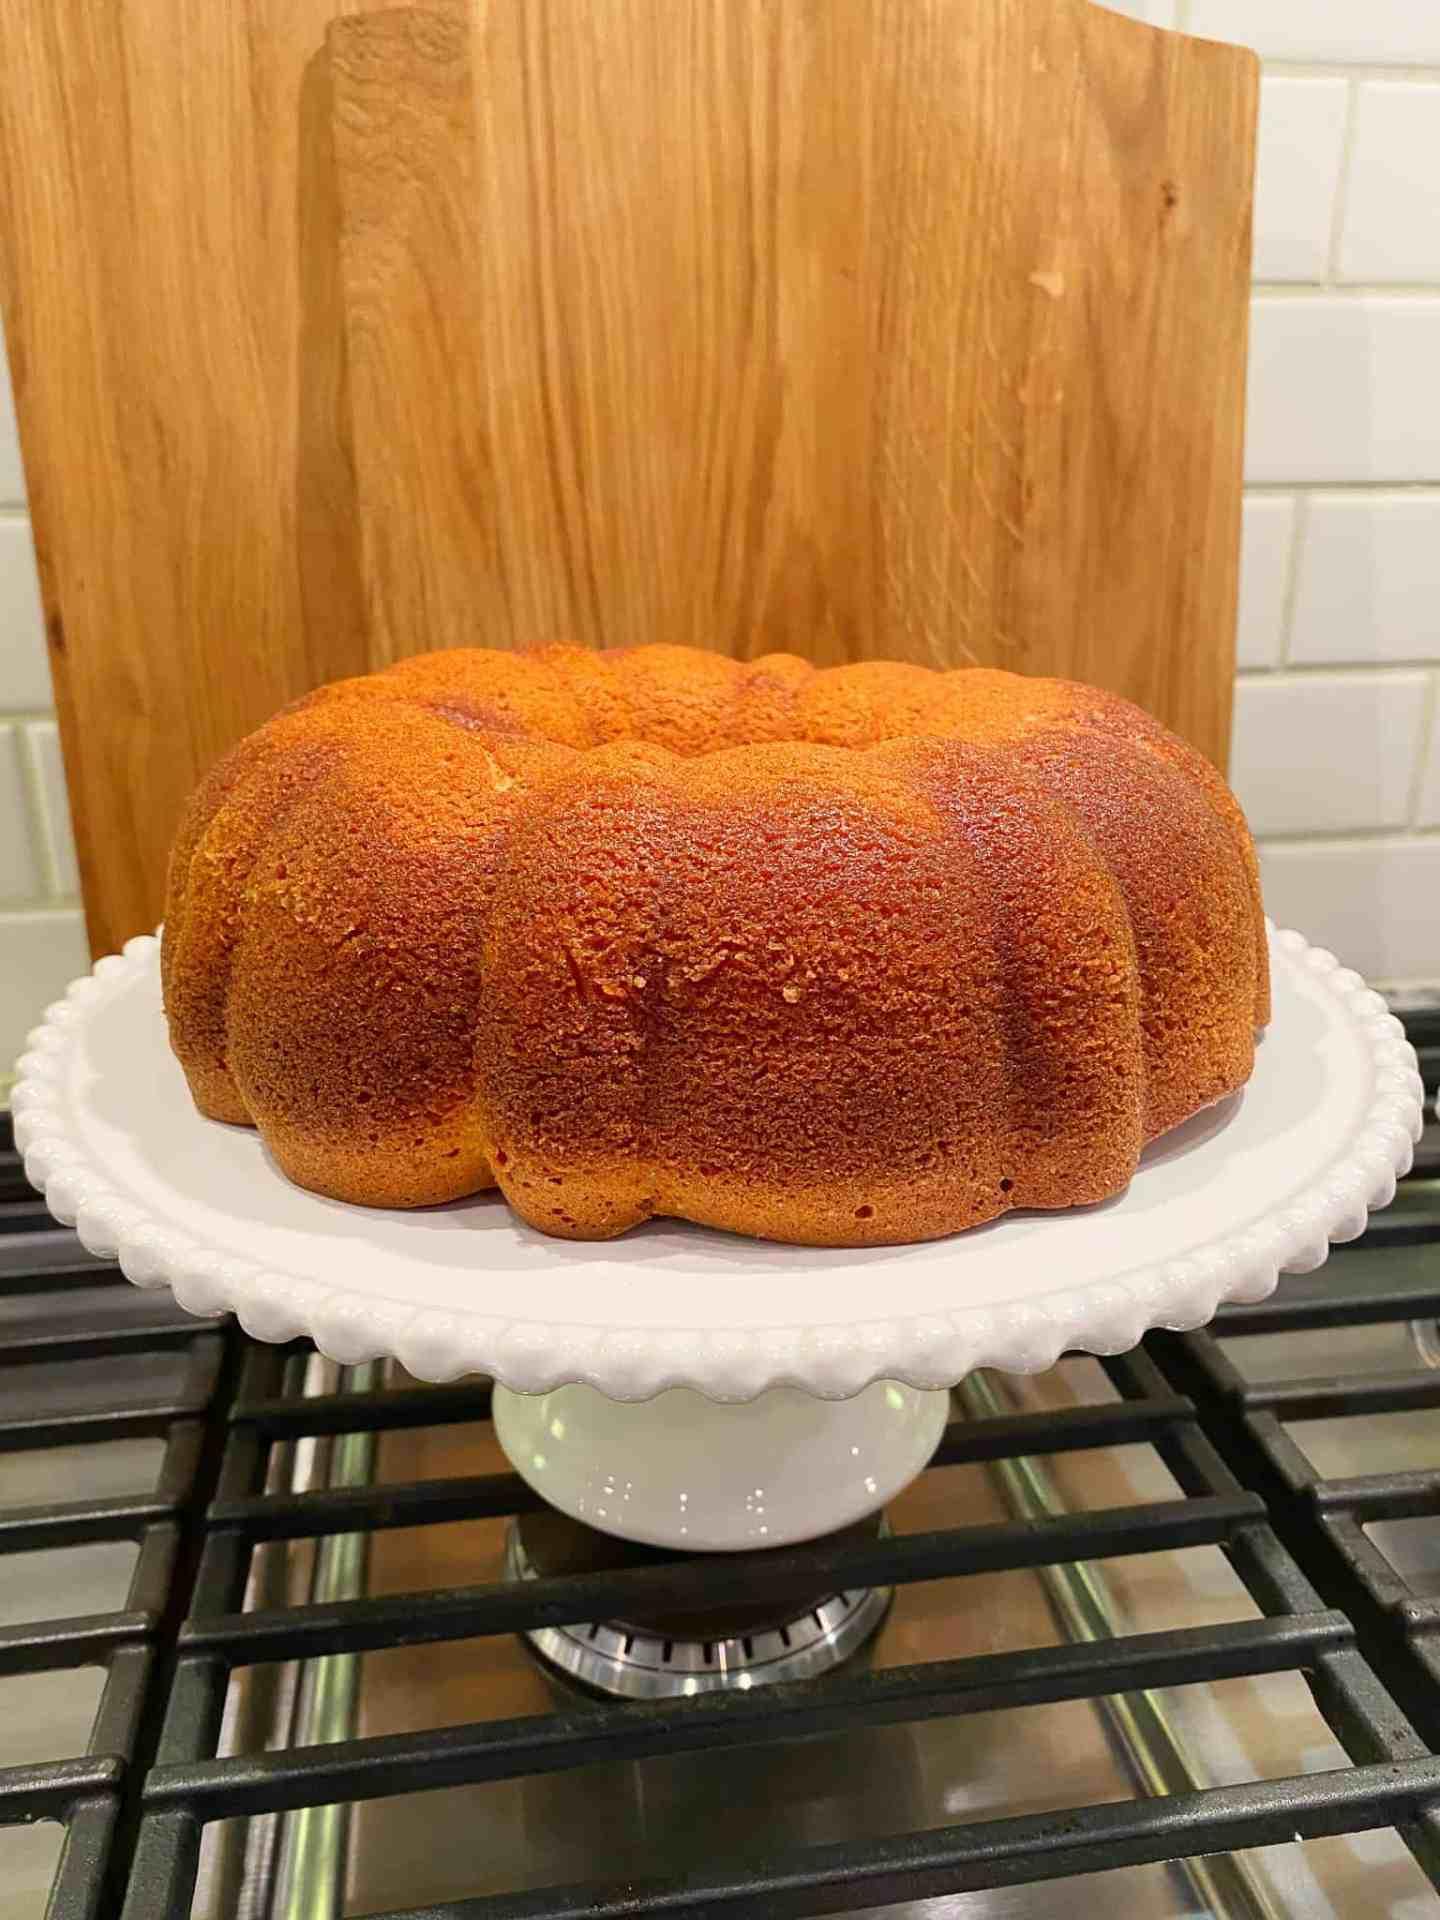 invert-cake-onto-stand